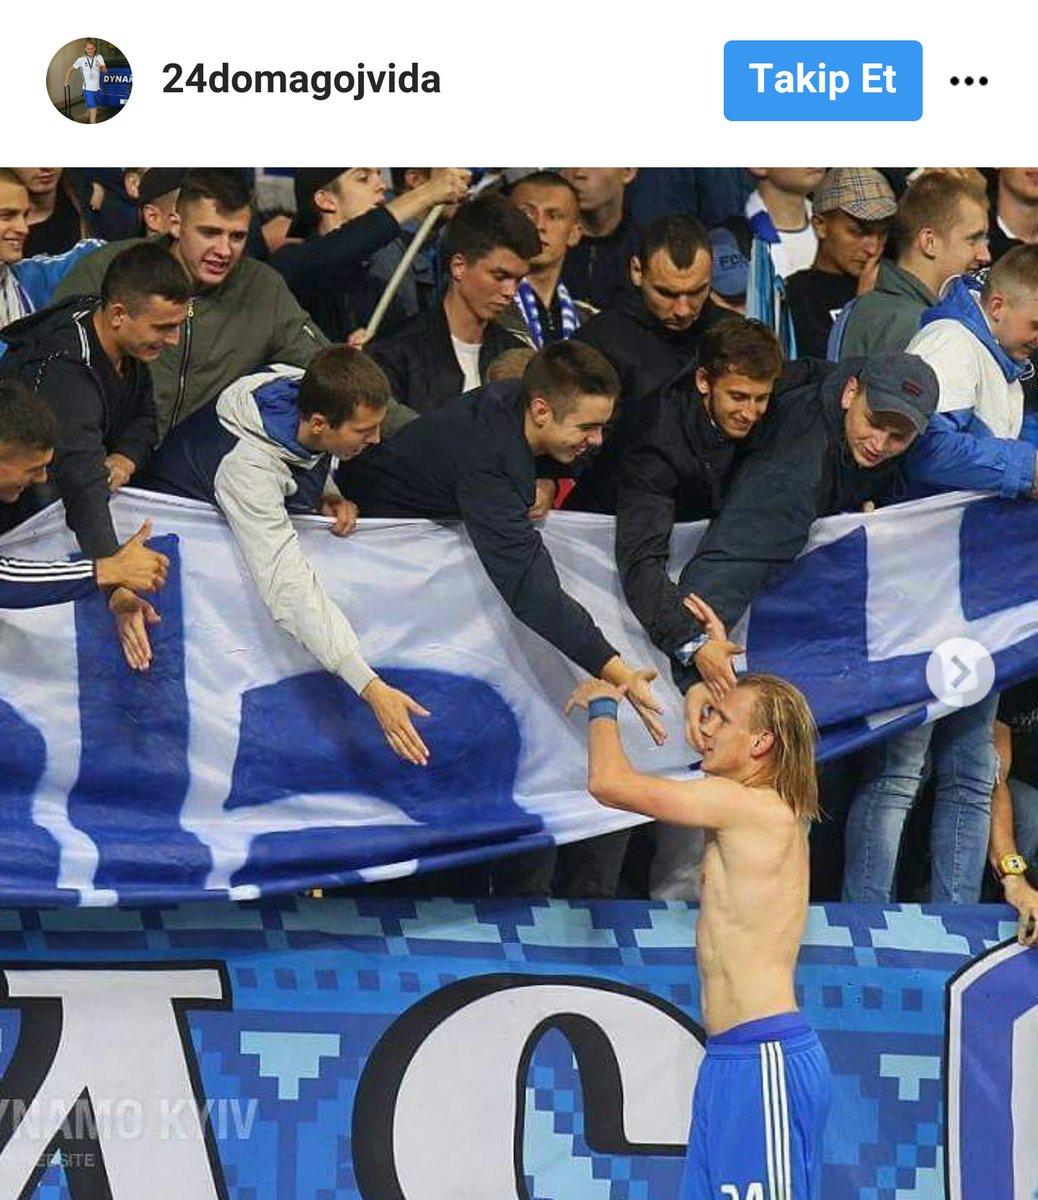 Domagoj Vida Fan On Twitter Domagoj Vida Resmi Instagram